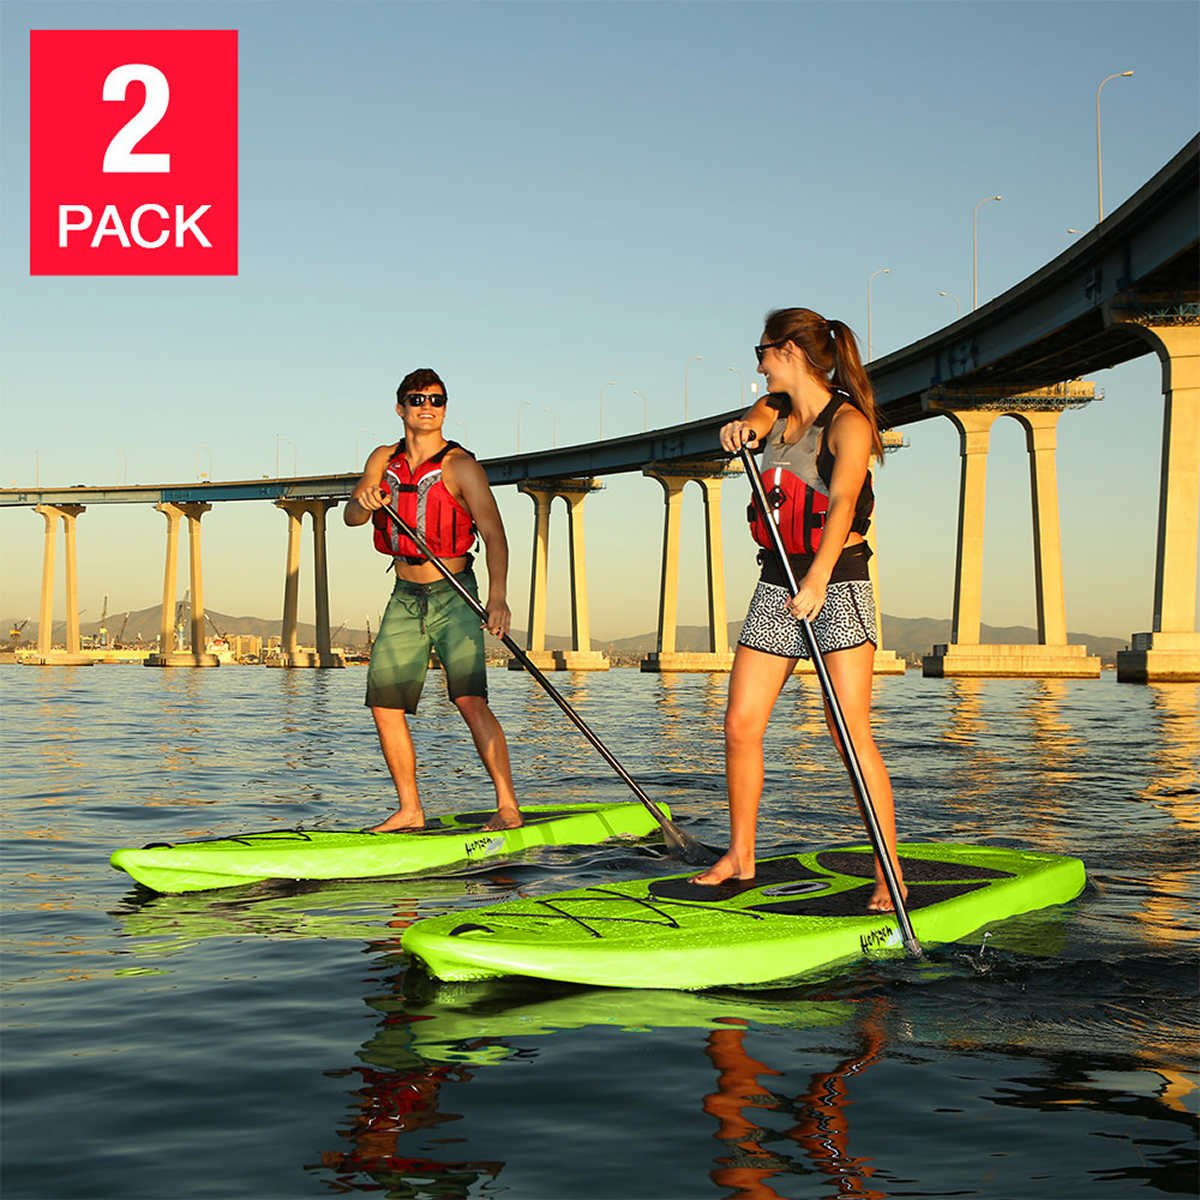 Amazon.com : Lifetime 10 Hardshell Horizon Stand Up Paddle Board 2-pack : Sports & Outdoors